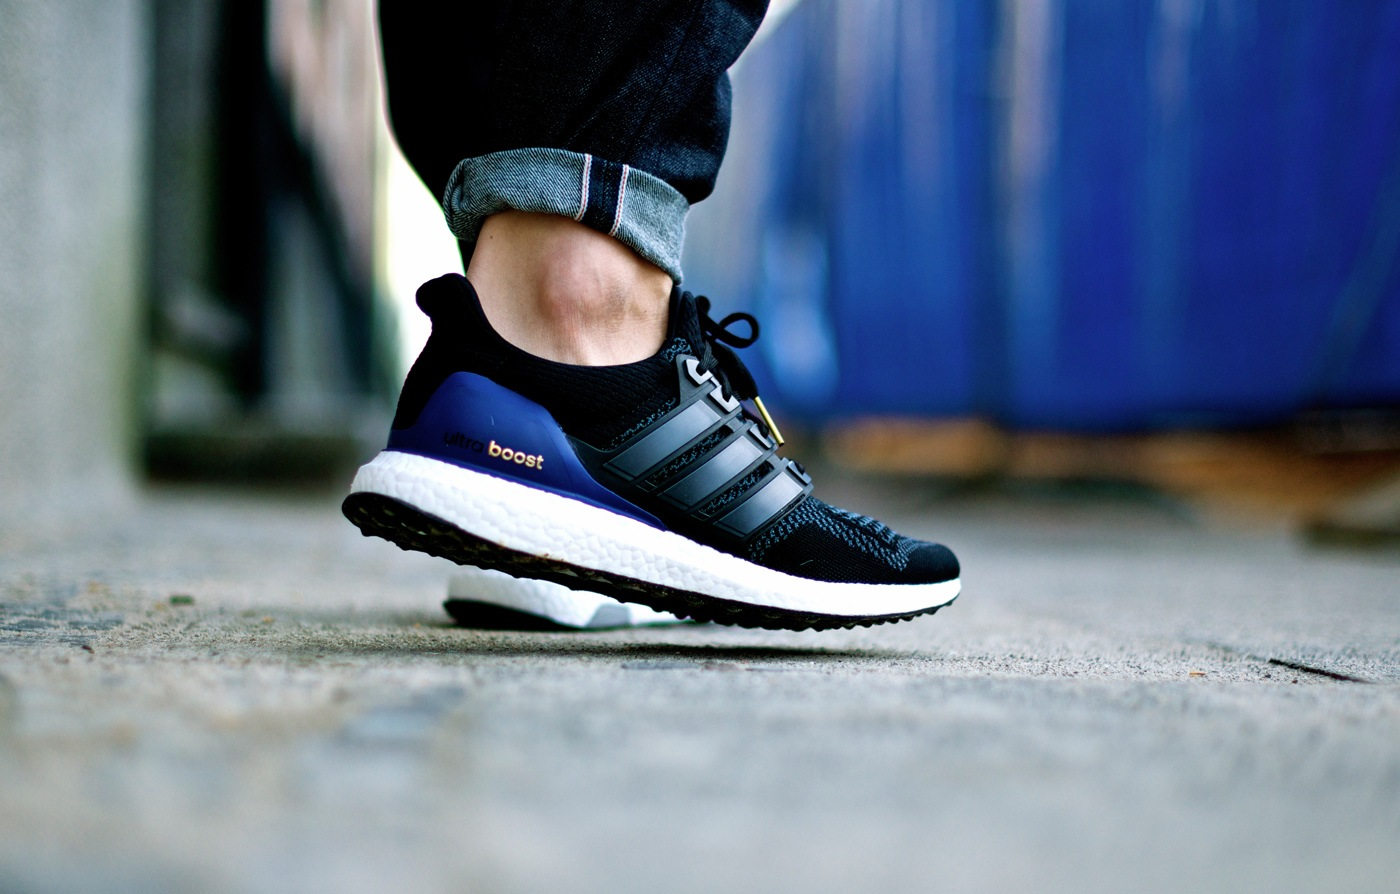 Adidas Boost Modelle